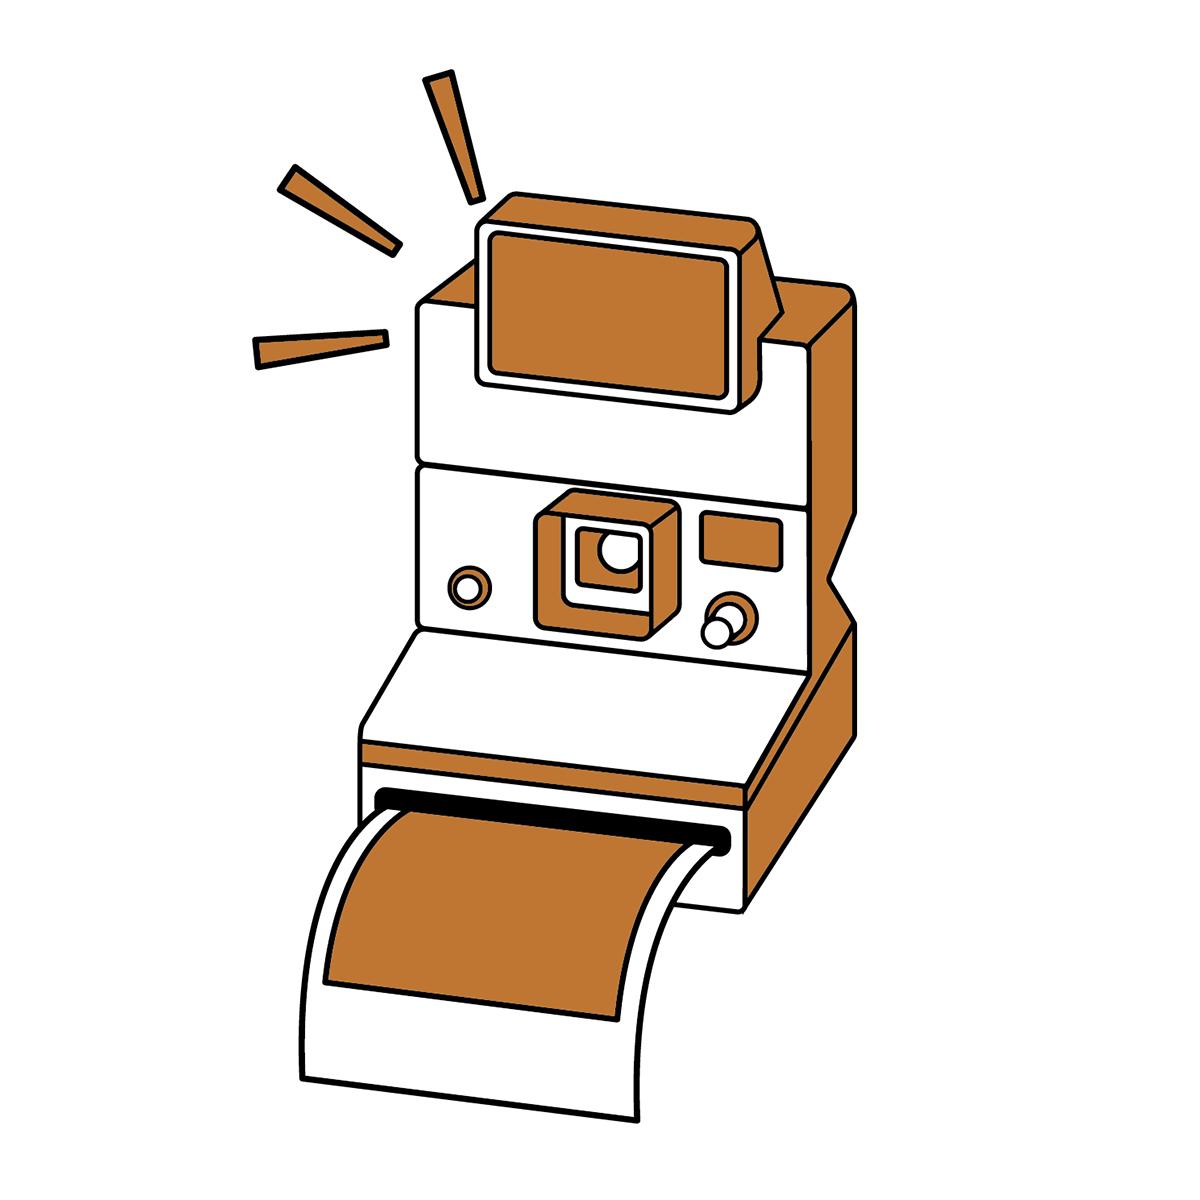 JUW25001 - Assortment Box, Detaljer for Baser, 28 mm, Tabletop